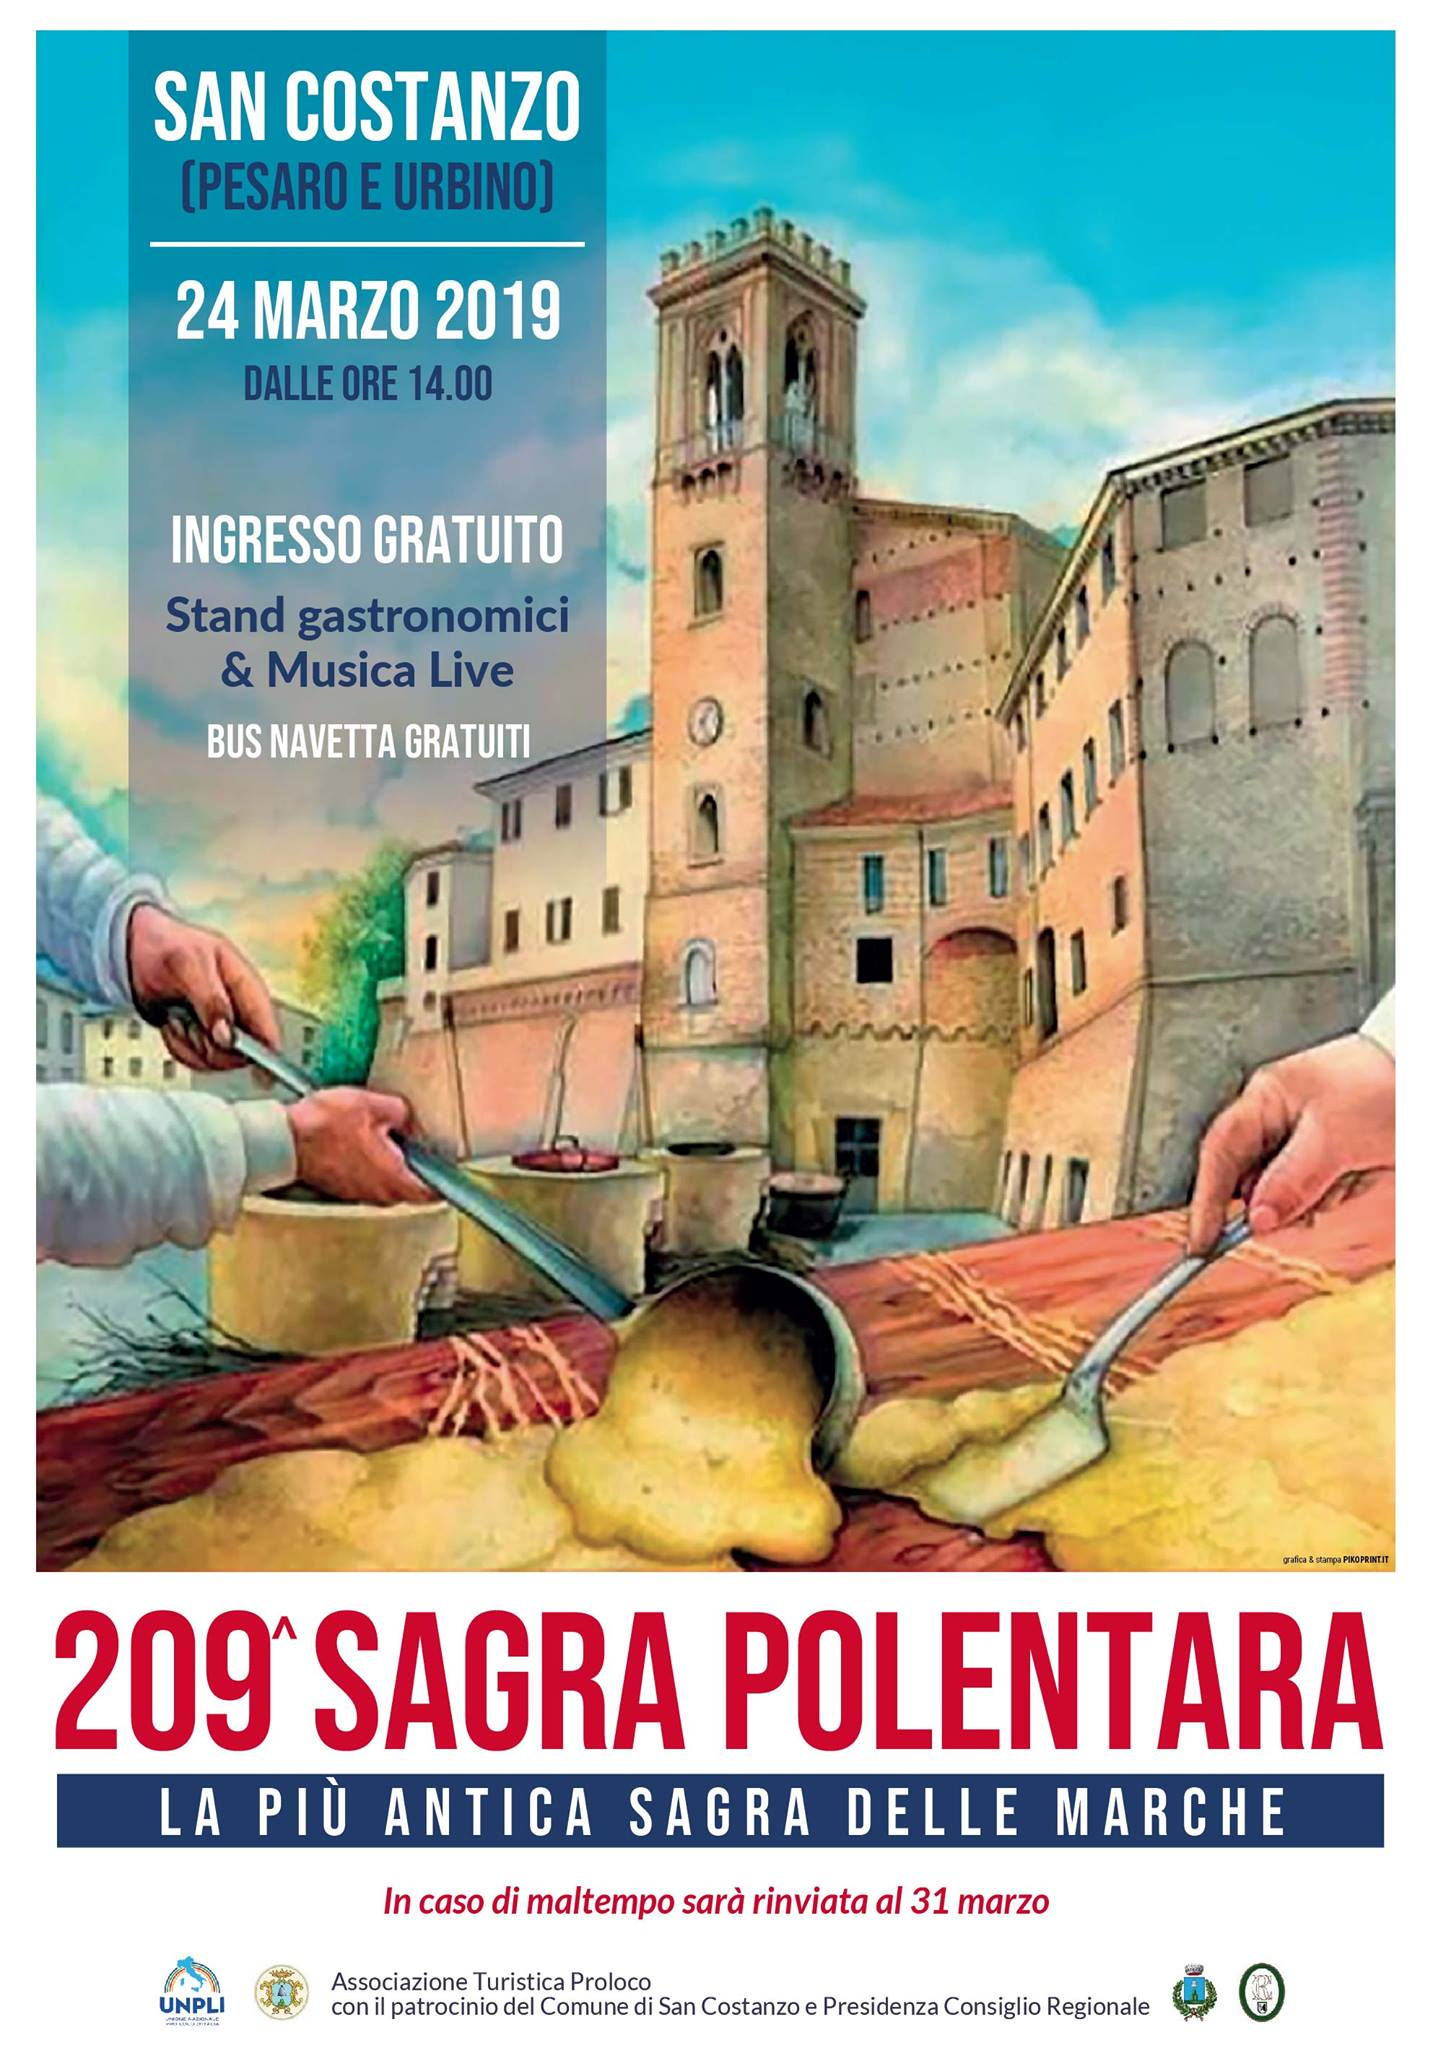 sagra polentara 2019